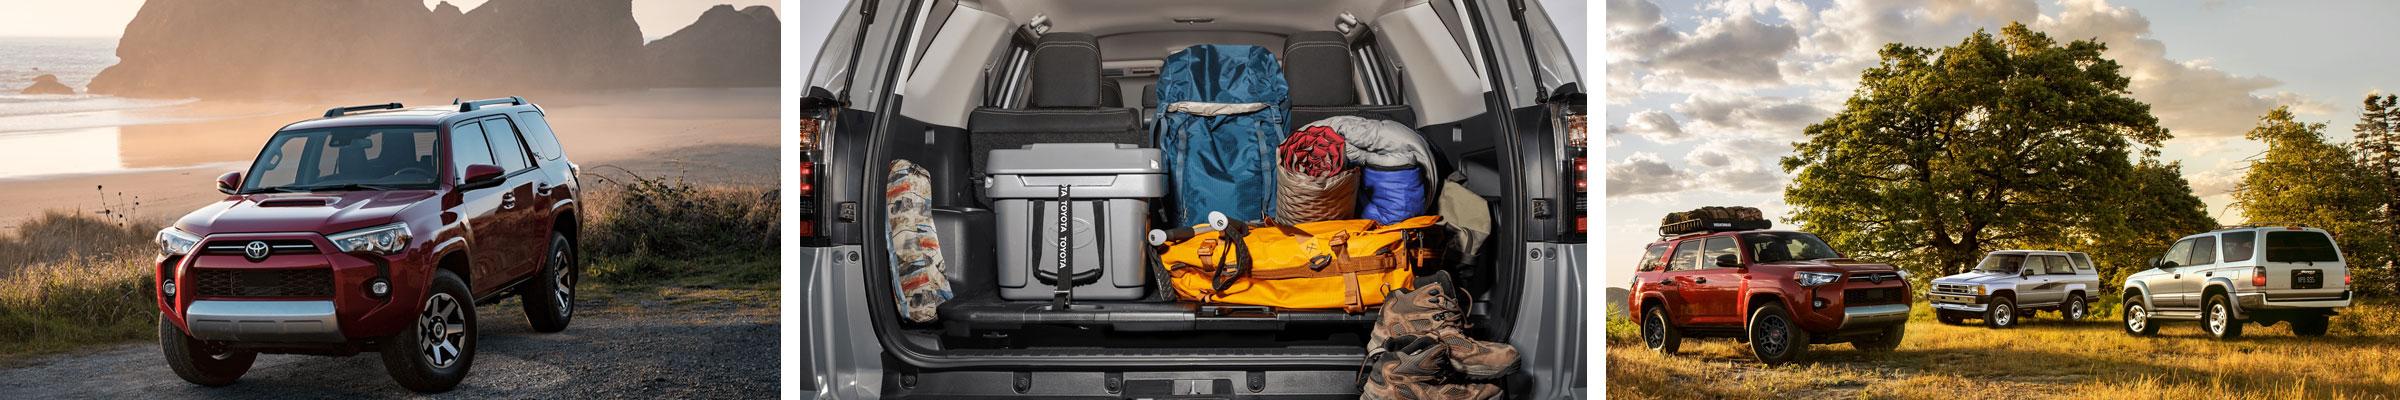 2021 Toyota 4Runner For Sale Savannah GA | Chatham County